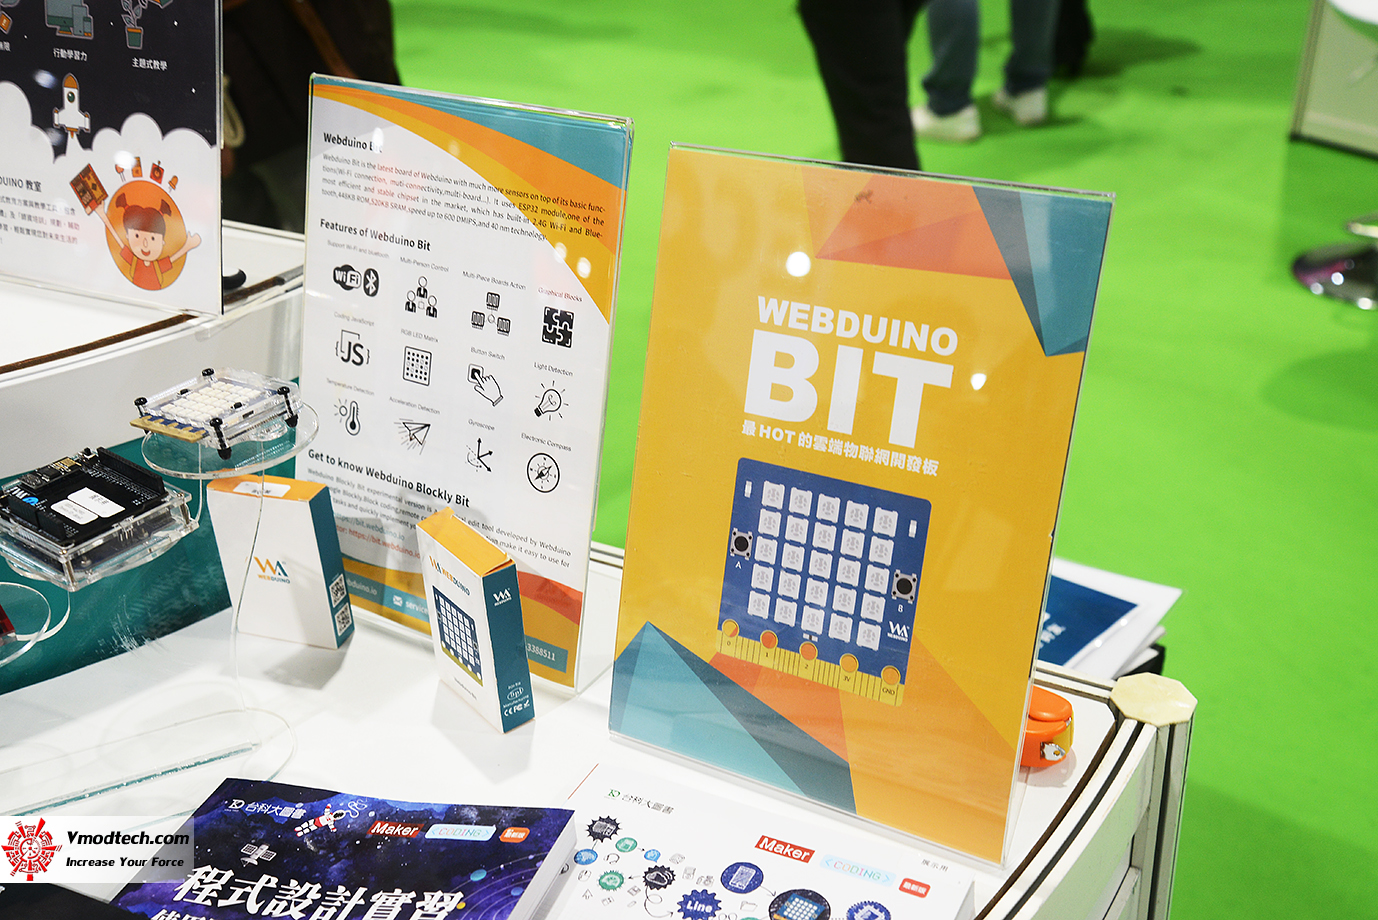 dsc 8473 เยี่ยมชมบูธ Smart Education ระบบการศึกษาอัจฉริยะในงาน 2019 SMART CITY SUMMIT & EXPO ณ กรุงไทเป ประเทศไต้หวัน